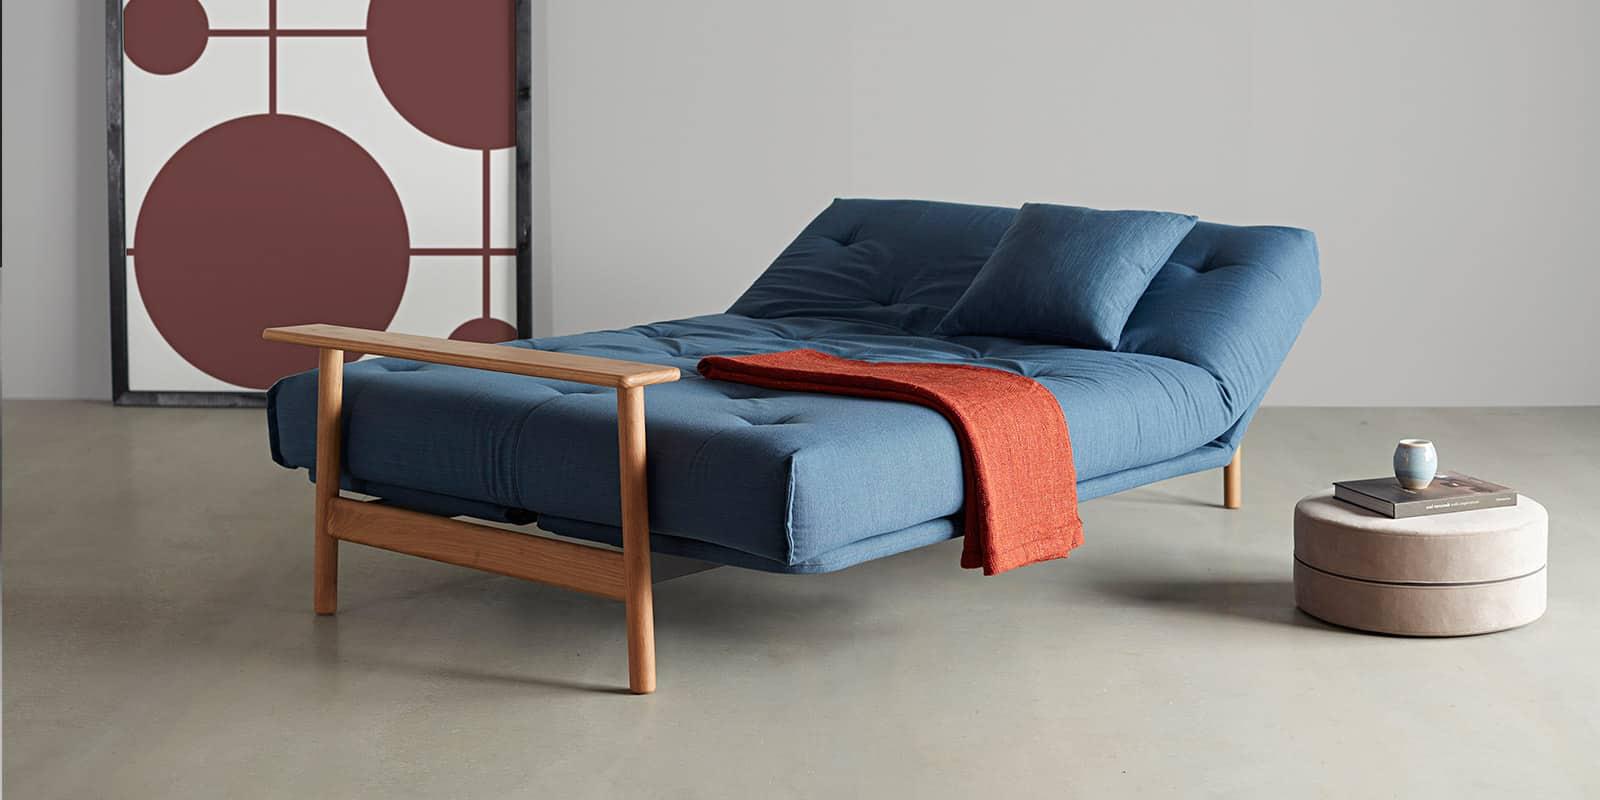 Full Size of Klappbares Doppelbett Bett Bauen Innovation Living Mbel Schlafsofas Und Design Sofas Ausklappbares Wohnzimmer Klappbares Doppelbett